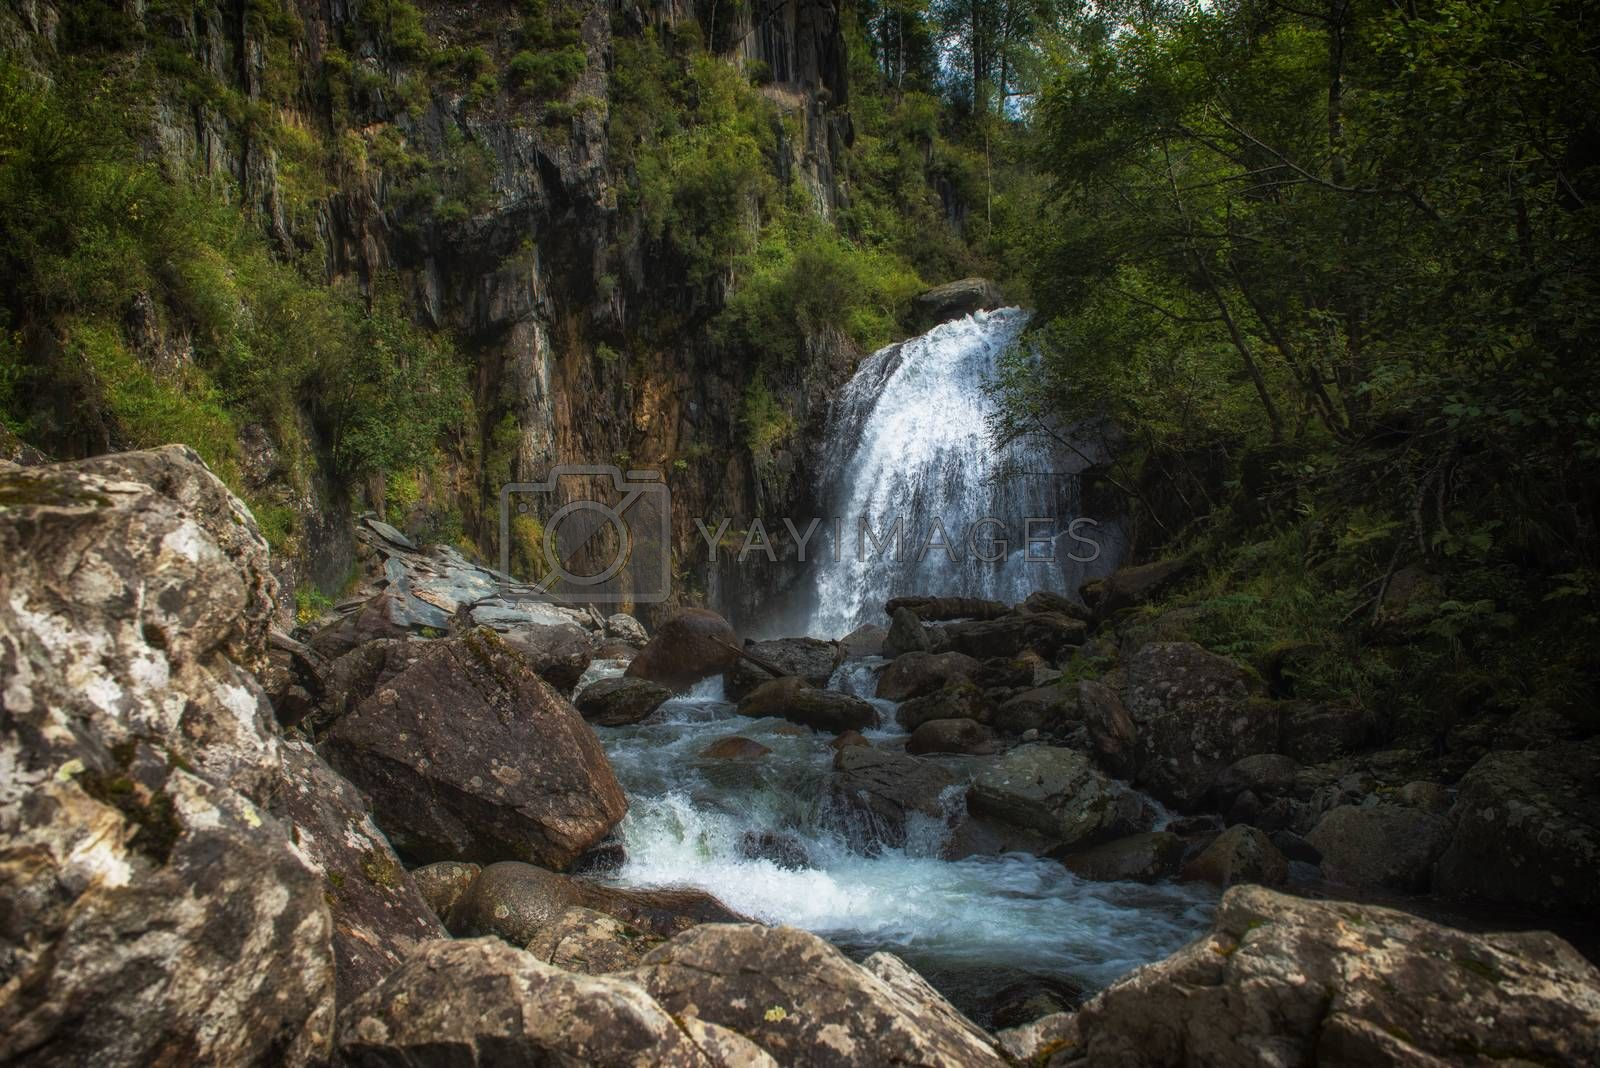 Korbu Waterfall at Lake Teletskoye in the Altai Mountains. The most famous lake waterfall